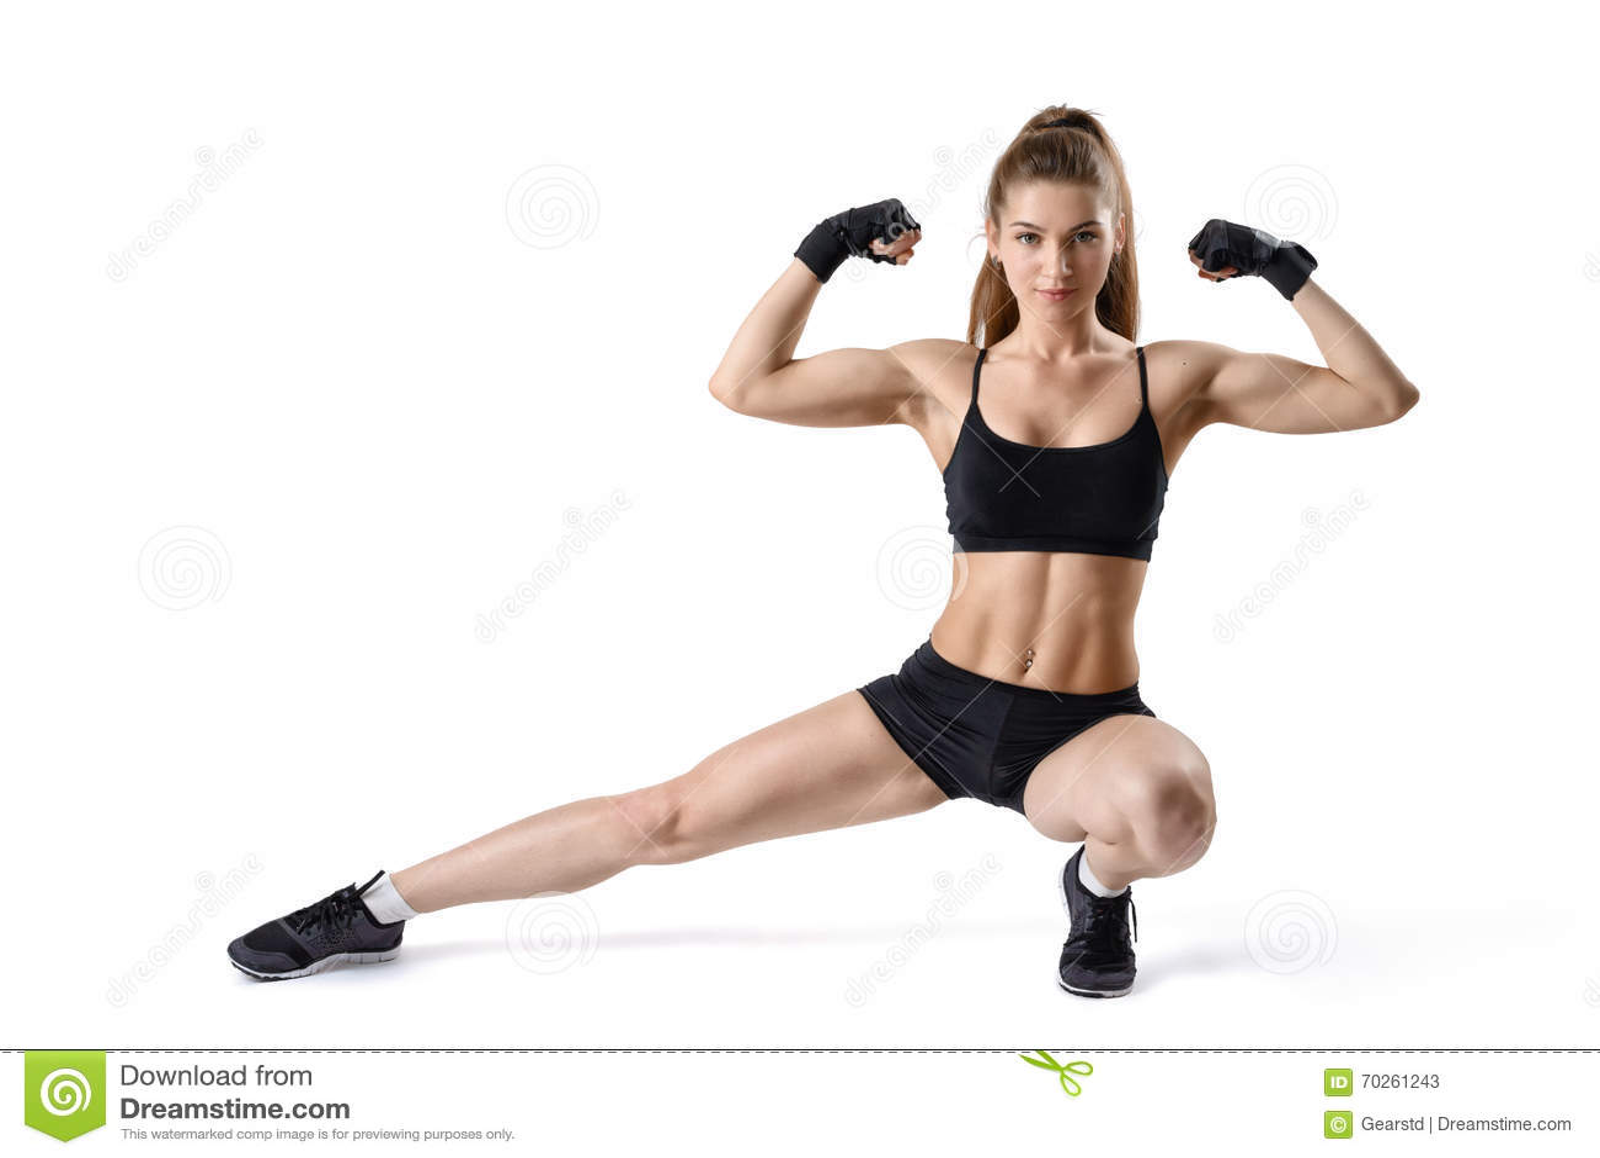 Free Hd Muscler Woman Porn 24